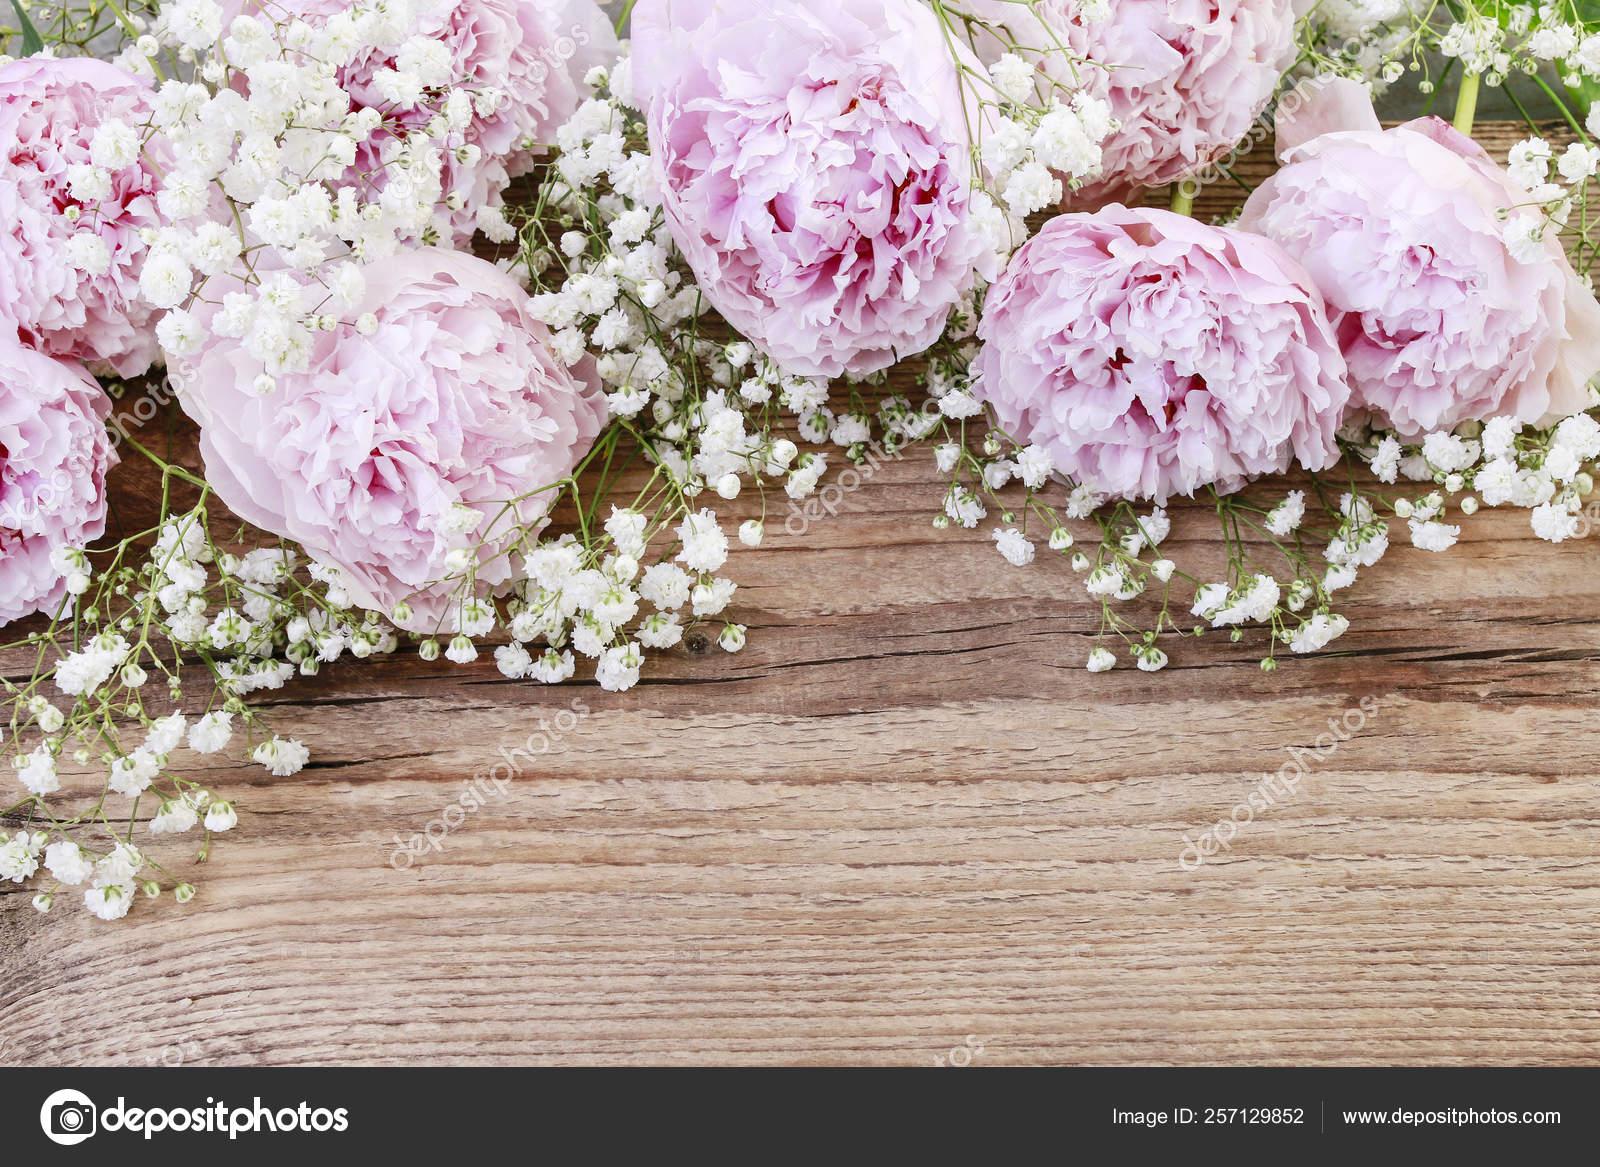 Pink Peonies White Ranunculus Flower And Gypsophila Paniculata Stock Photo C Agneskantaruk 257129852